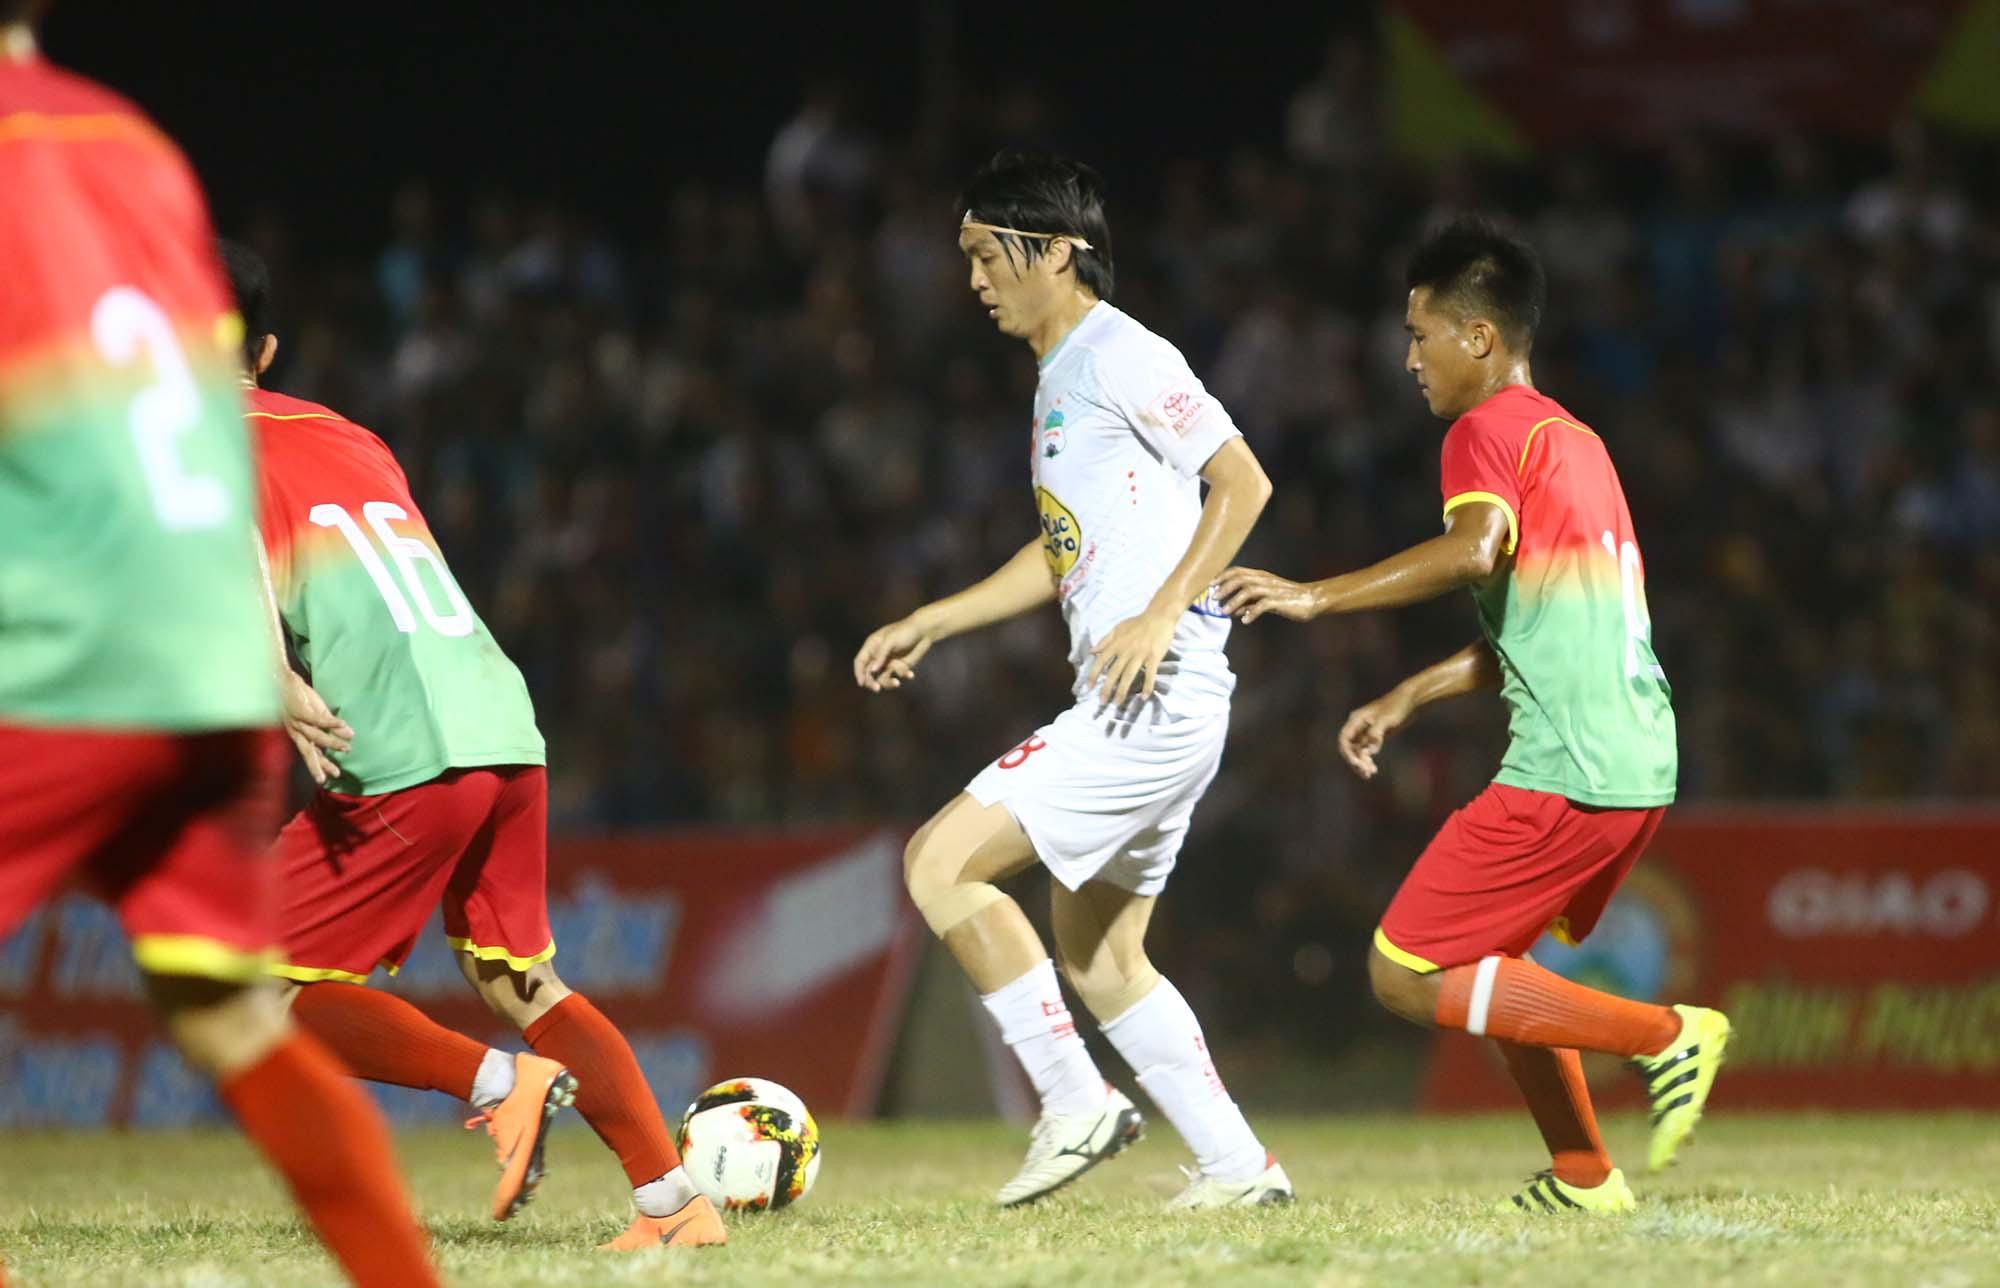 Tiền vệ Nguyễn Tuấn Anh: